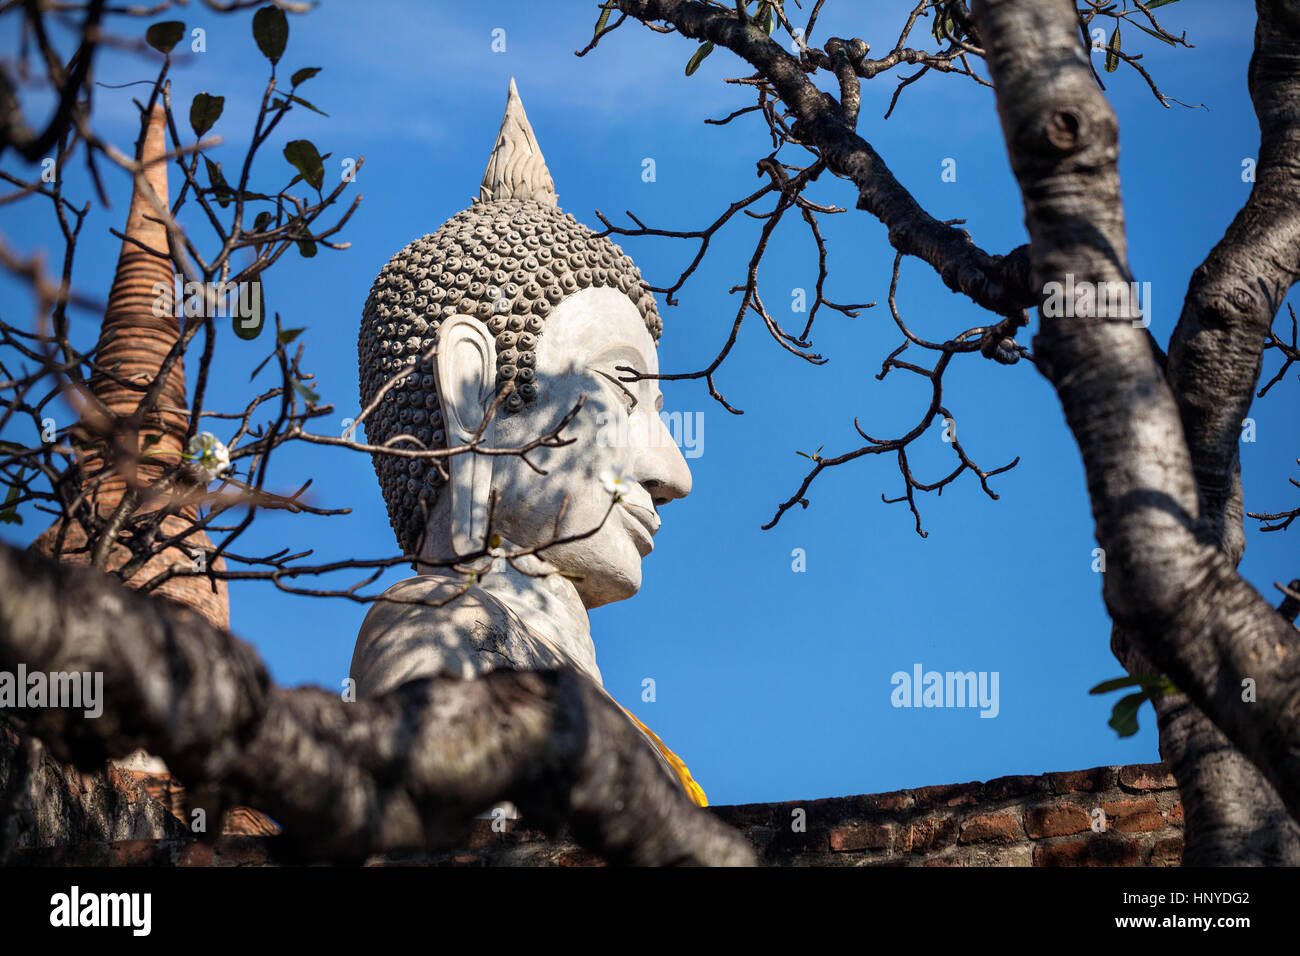 Big Buddha statue in Wat Yai Chai Mongkol monastery in Ayuttaya, Thailand Stock Photo